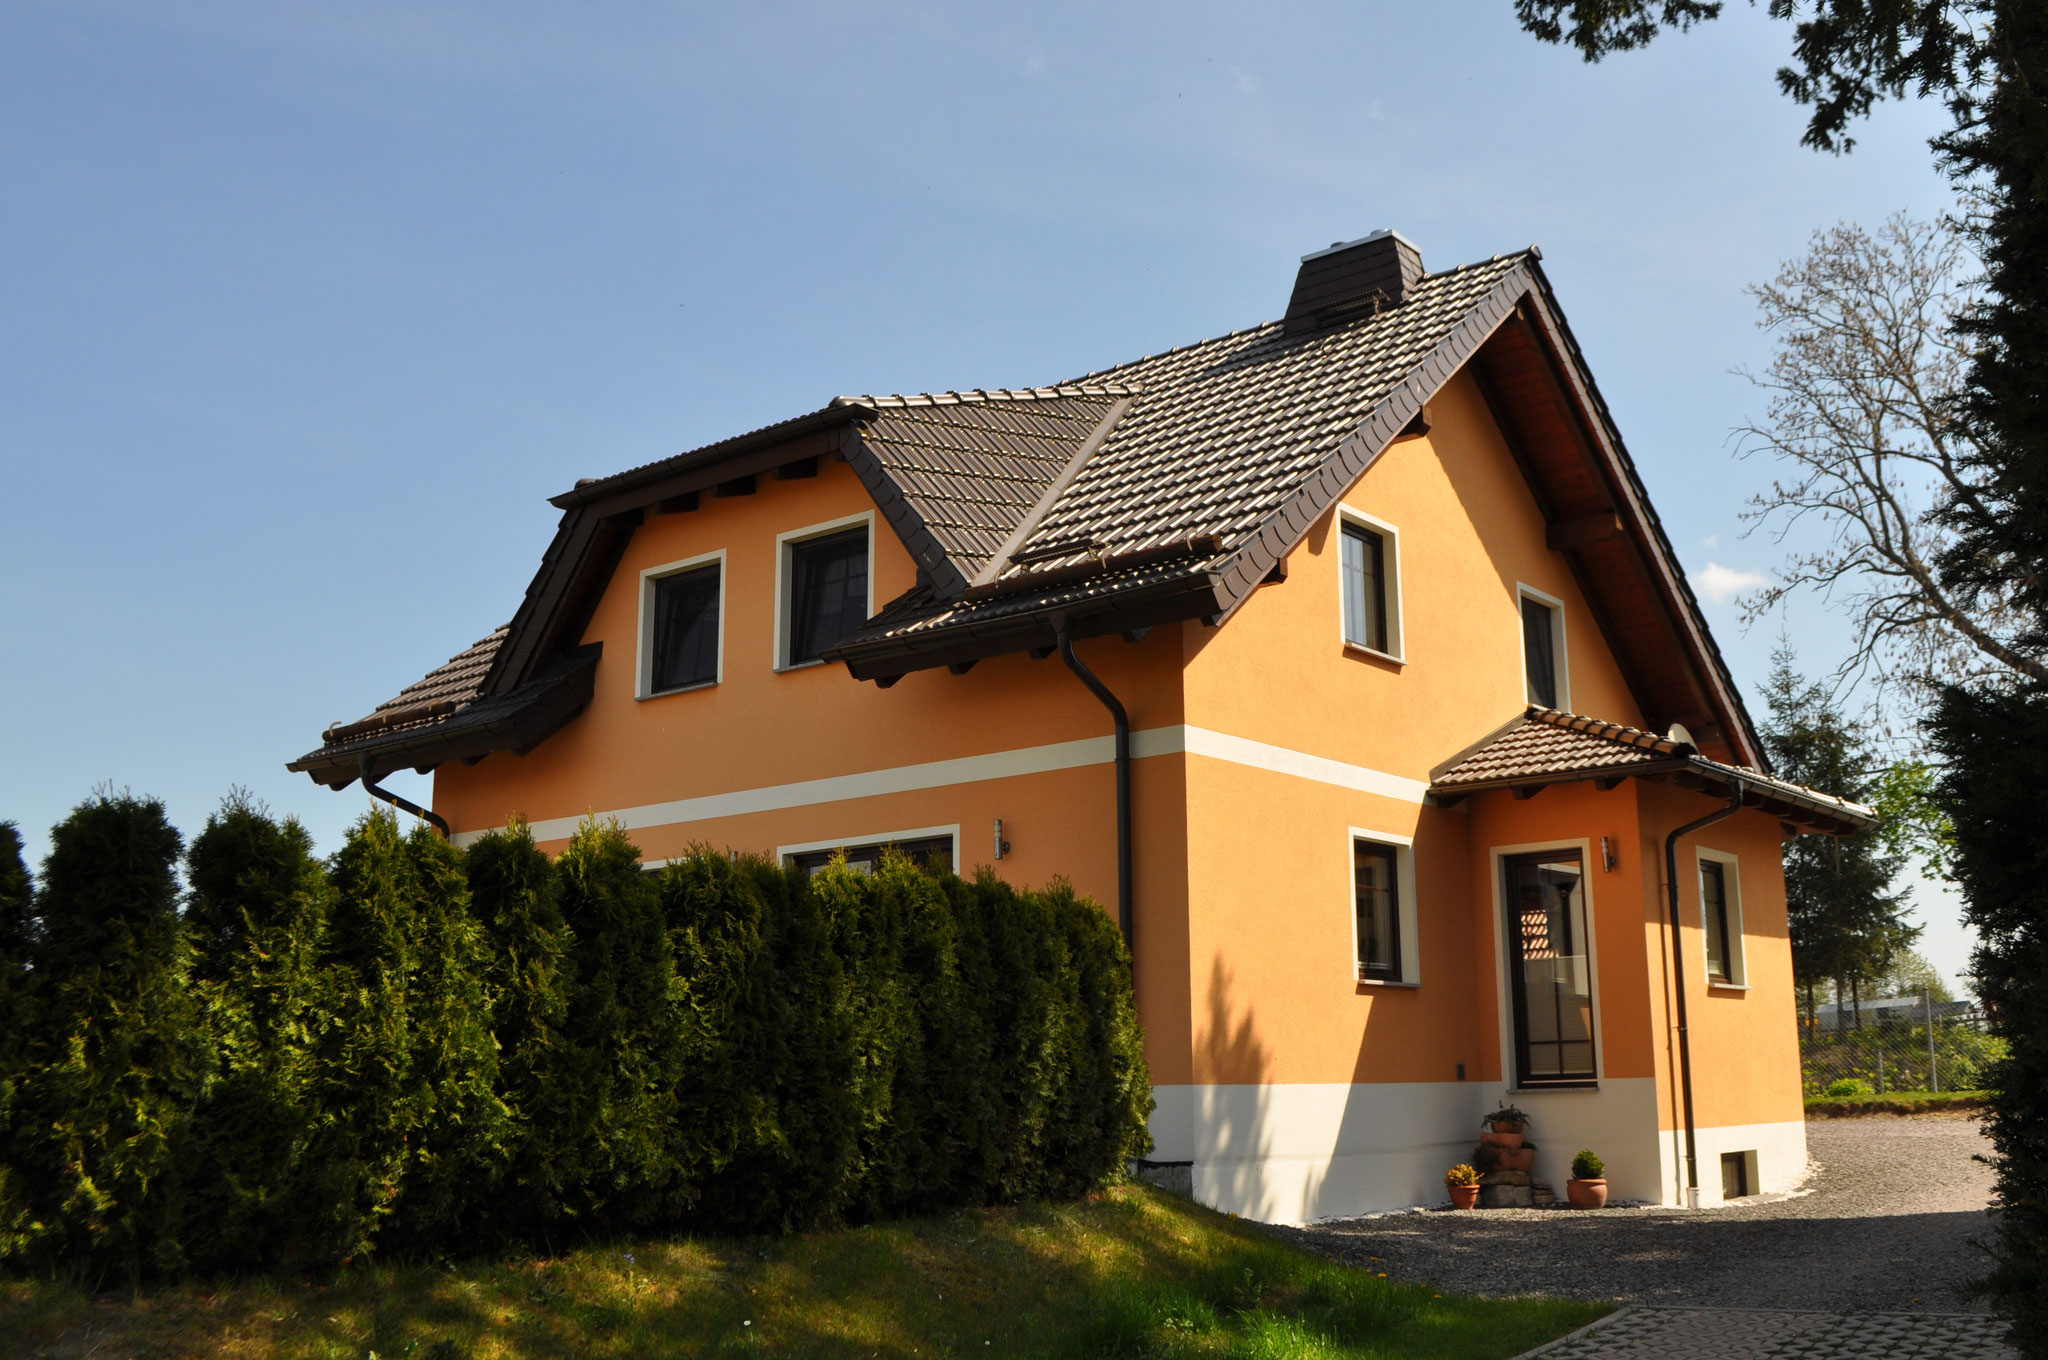 Dachstuhl Neubau Wohnhaus